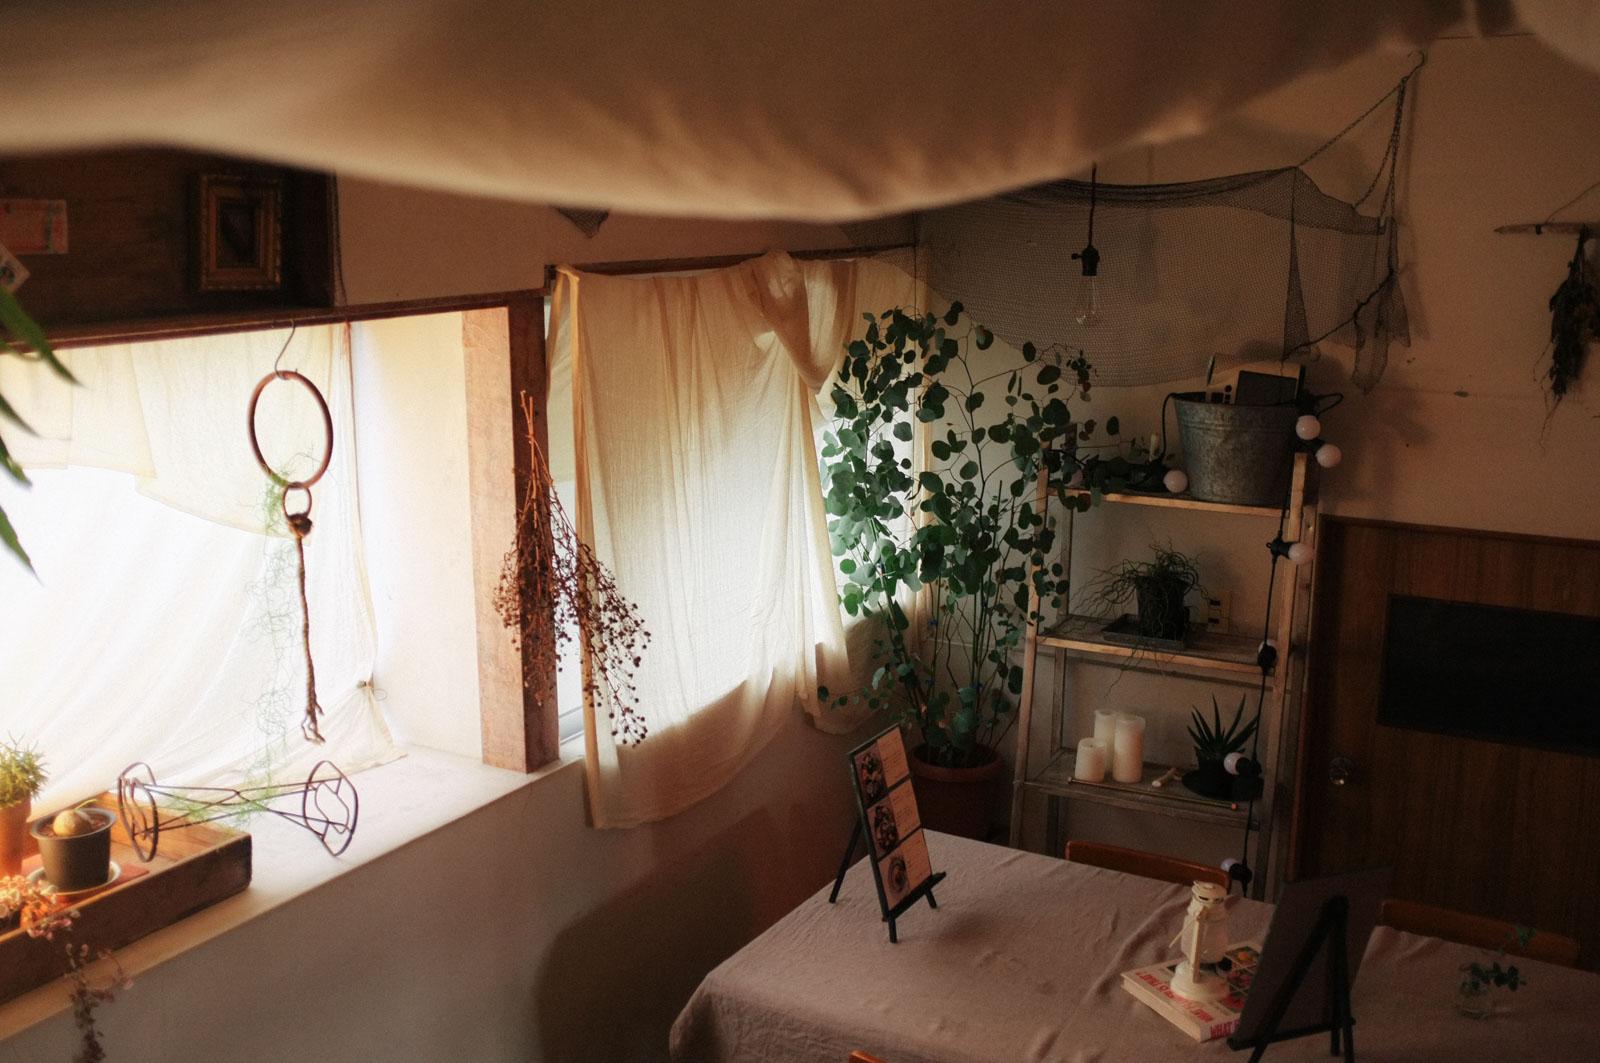 miki-airbnb-yado-009